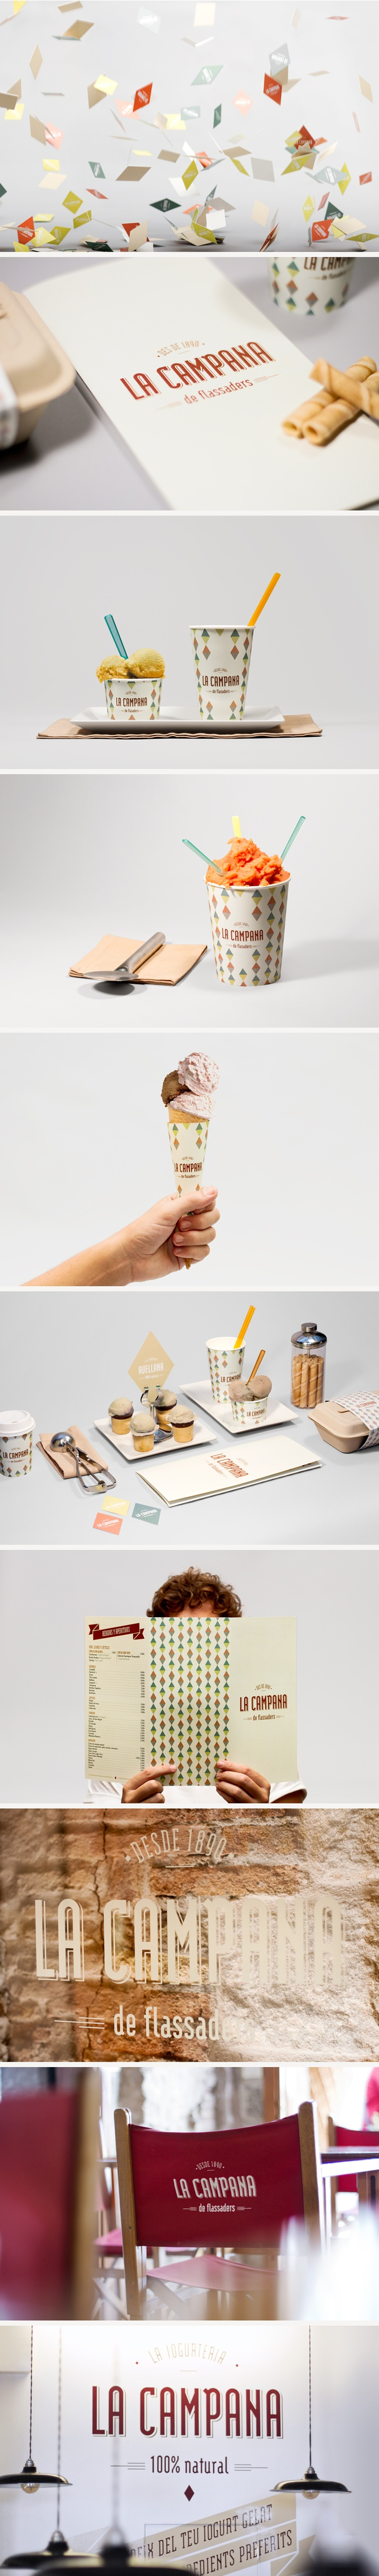 La Campana | Comité Studio #packaging #branding #marketing PD